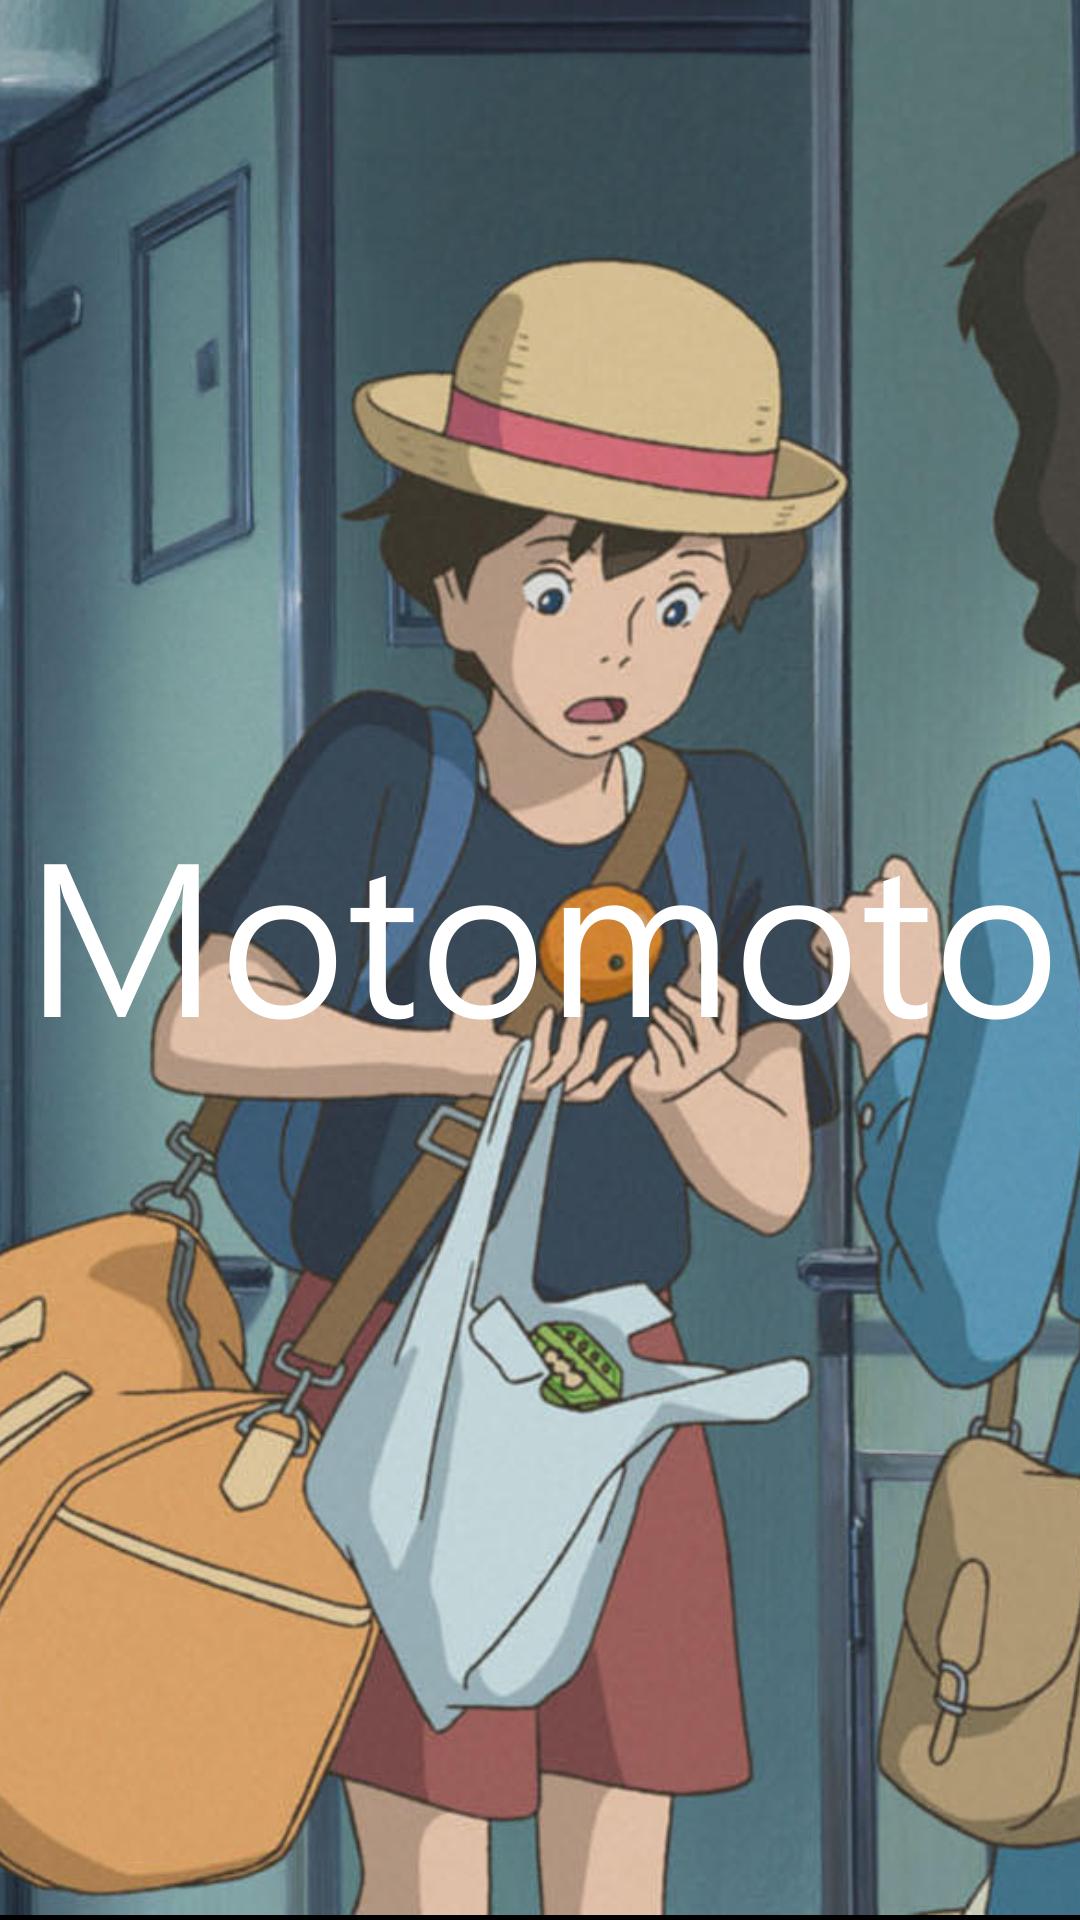 Motomoto